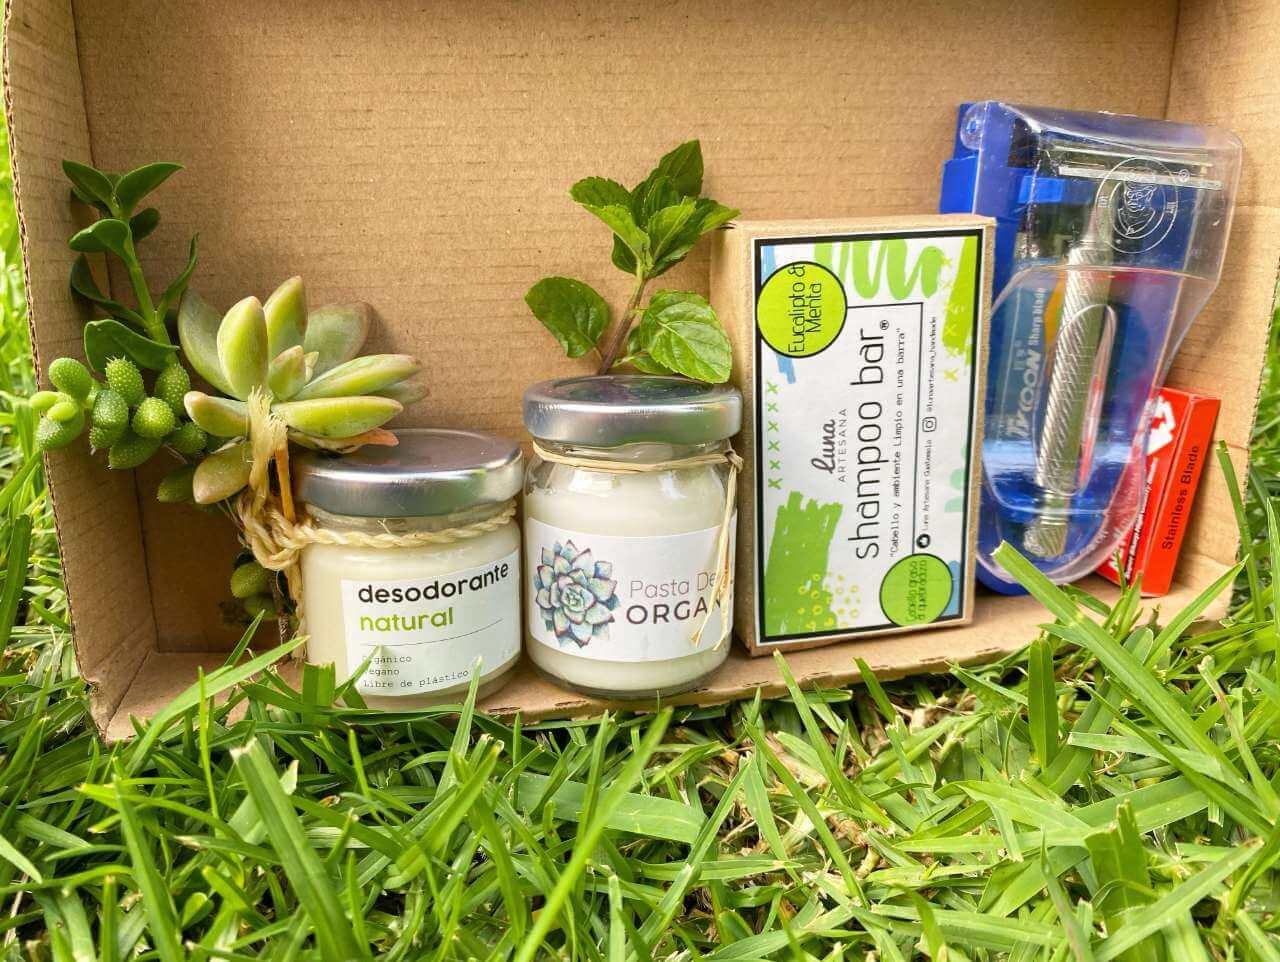 Productos disponibles en Organicum - Foto por Organicum